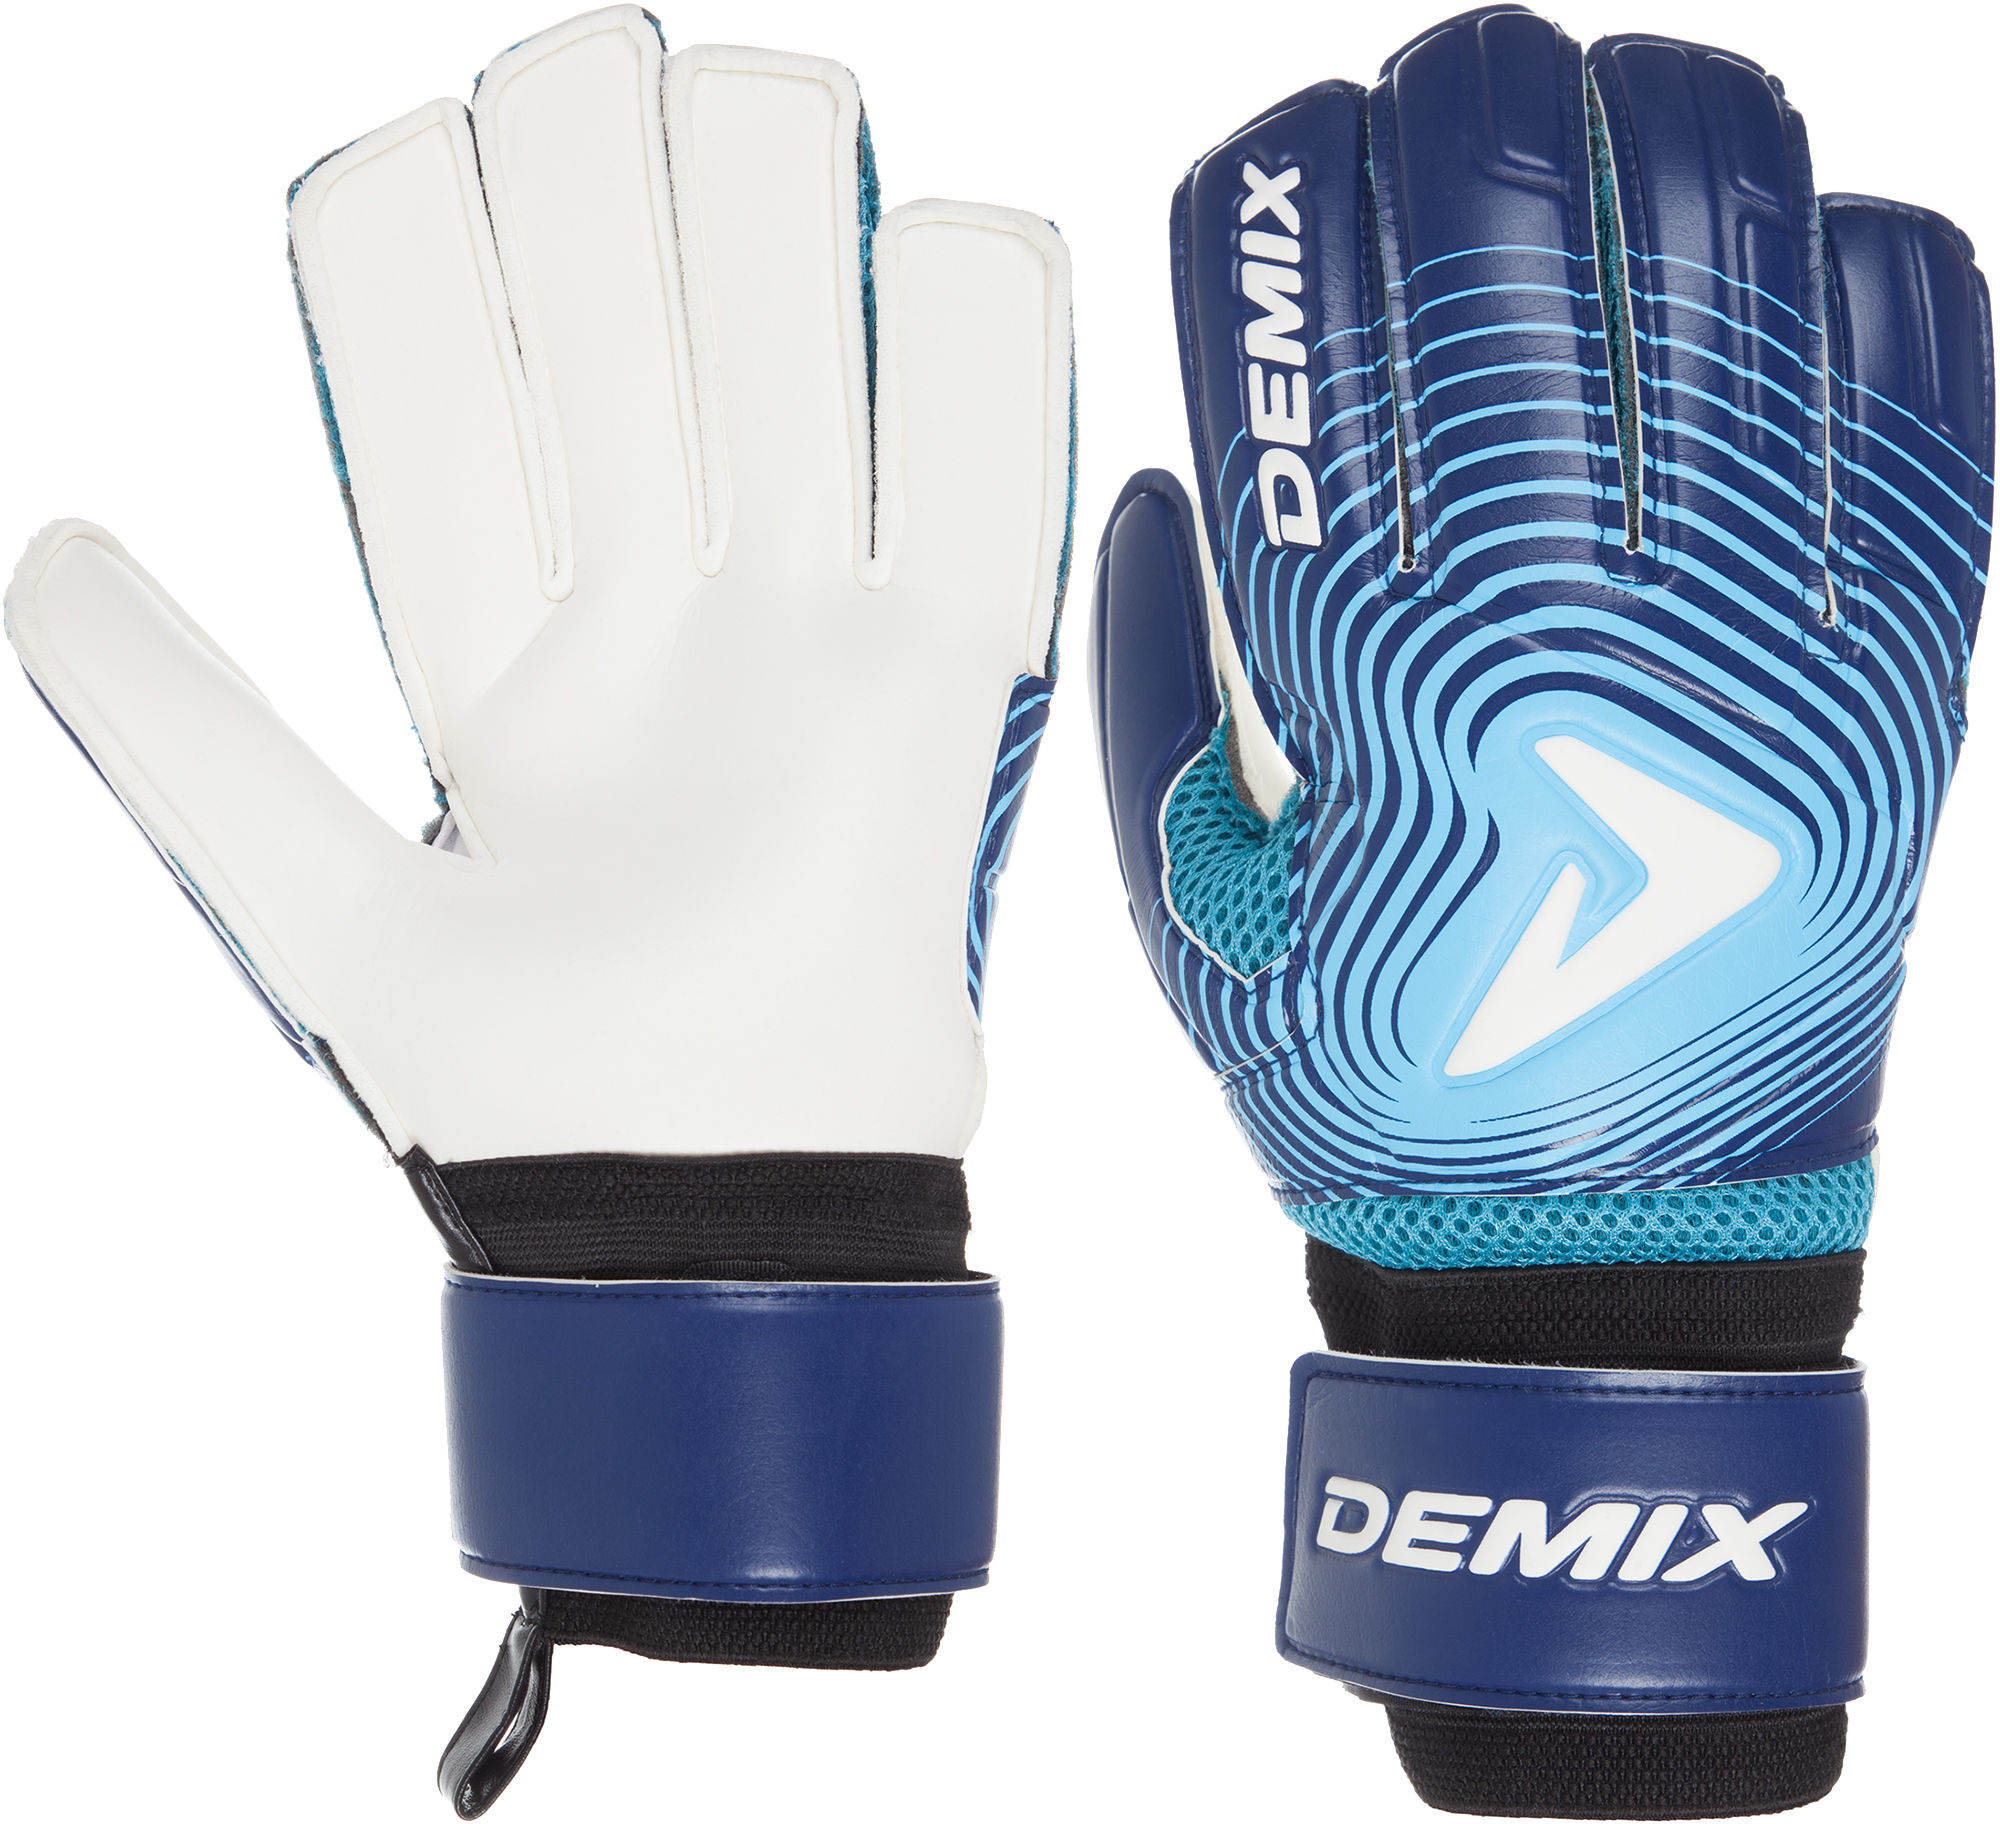 Demix Перчатки вратарские Demix, размер 10